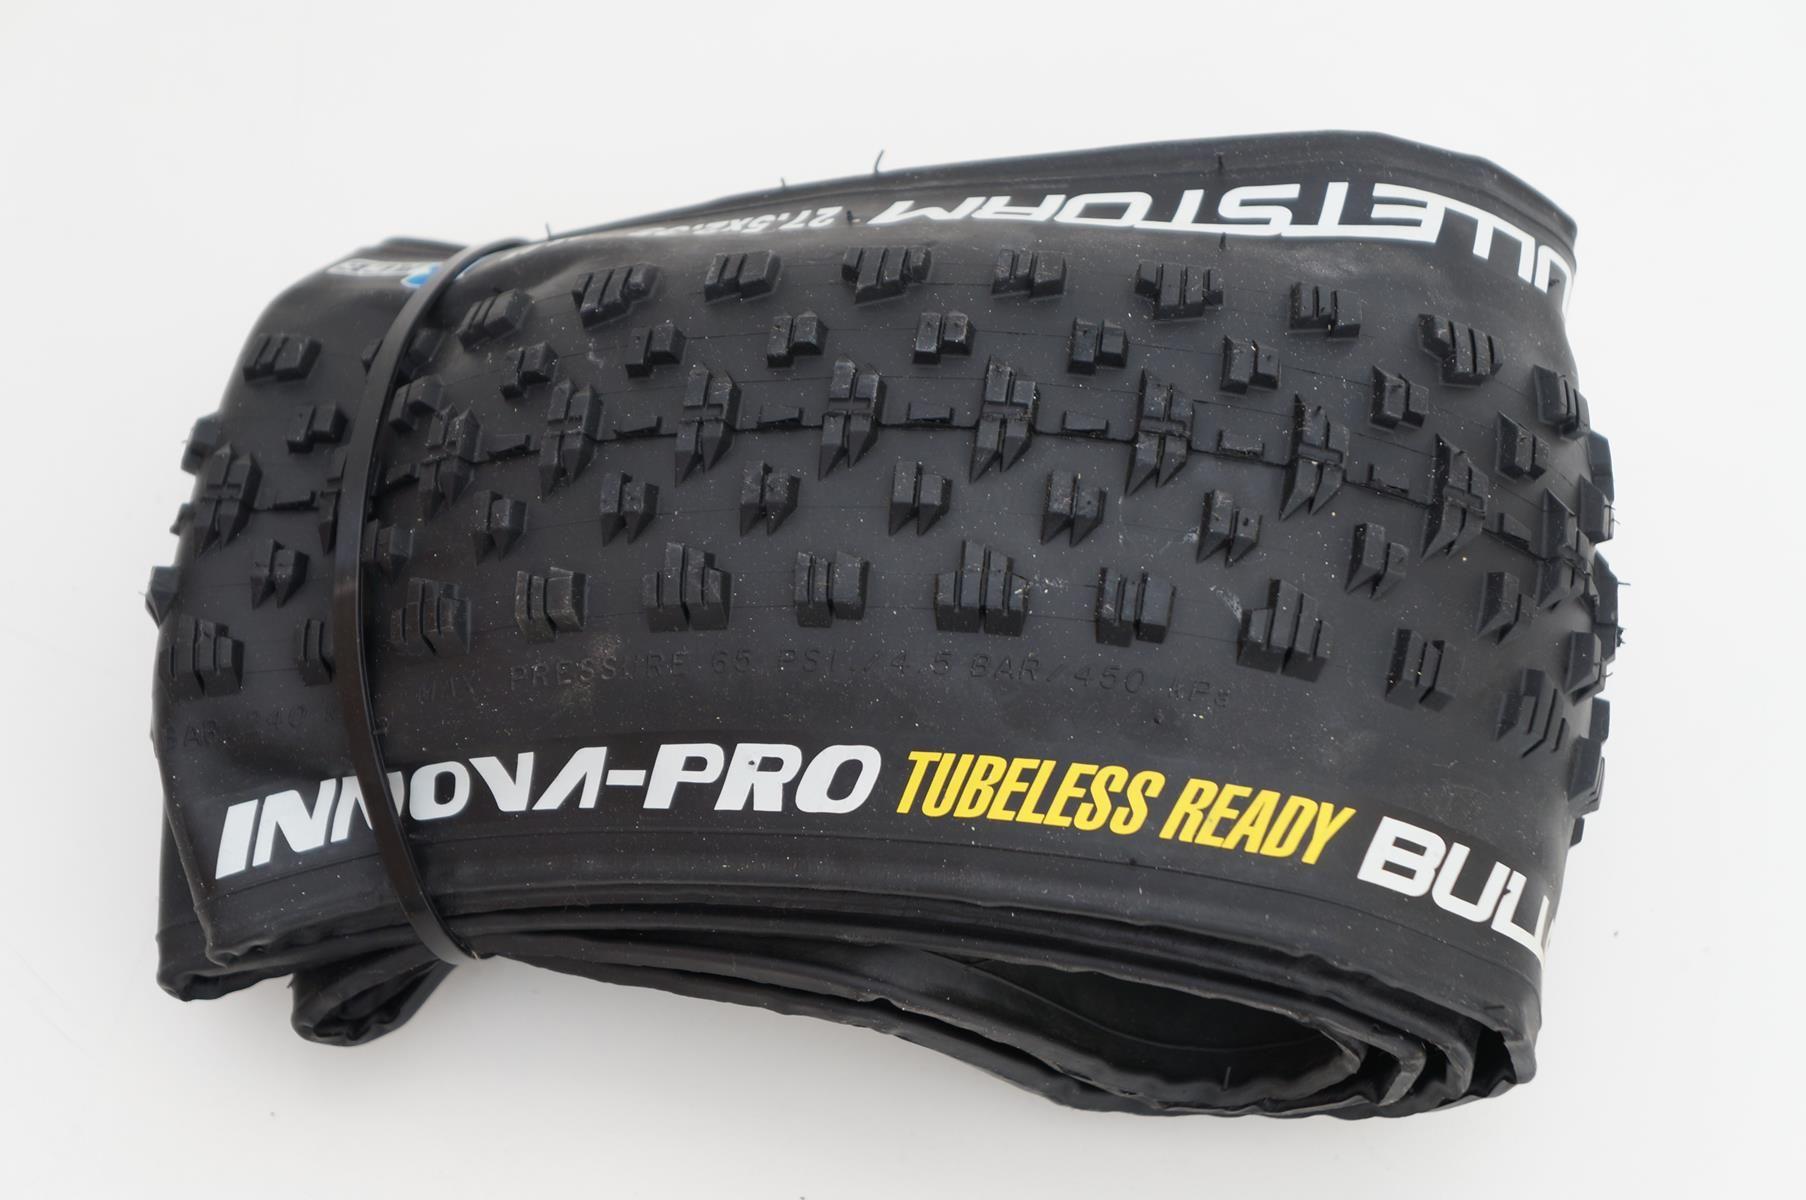 Pneu Innova Pro Bulletstorm 27.5 2.35 Tubeless Ready Dobrável em Kevlar